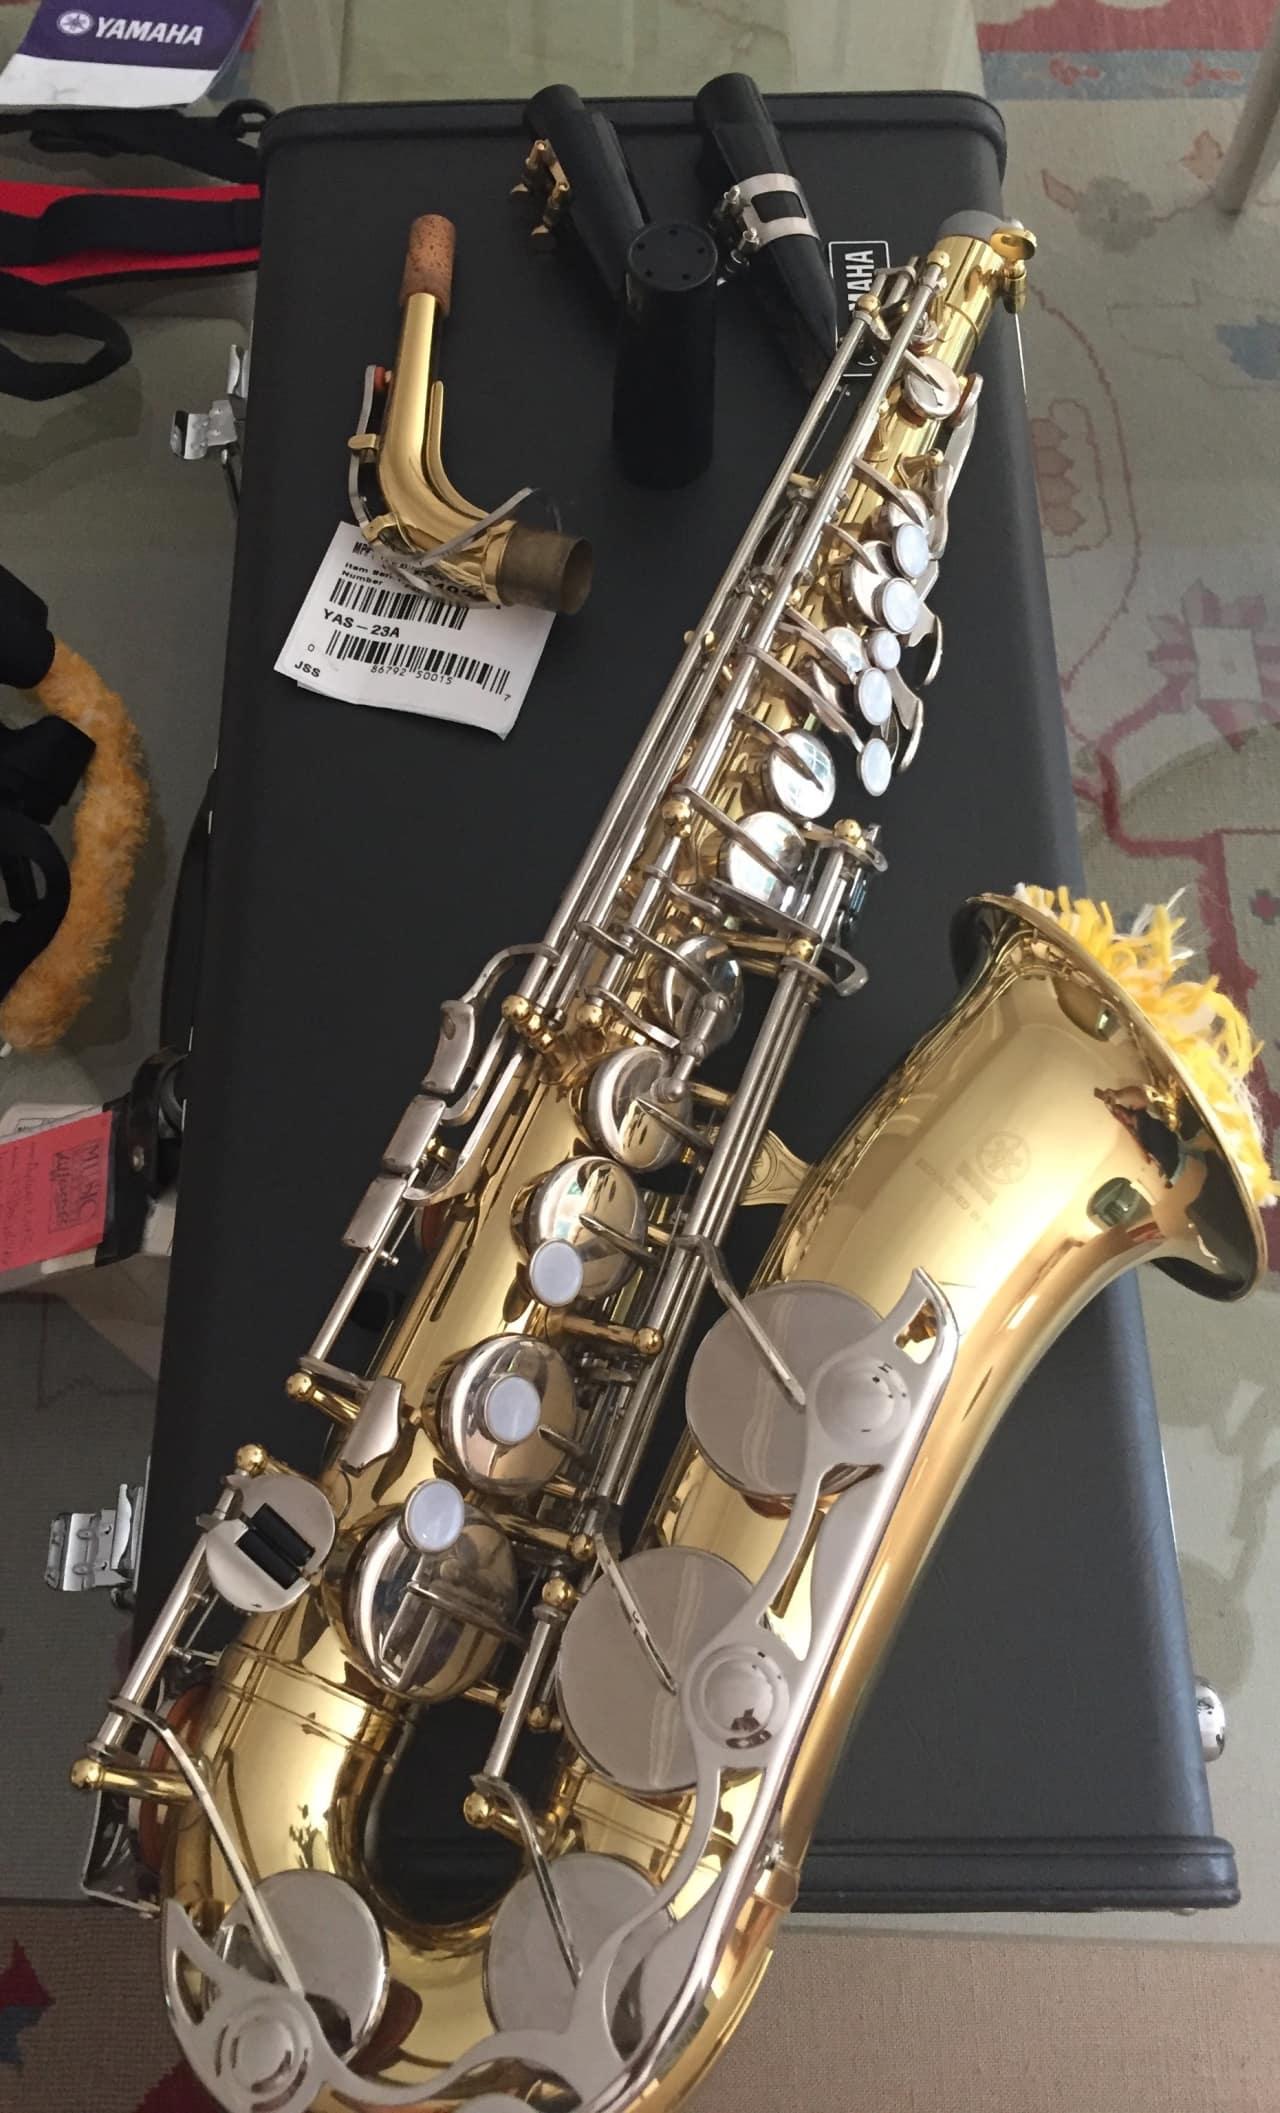 Yamaha yas 23 alto saxophone 2005 brass chrome alto sax for Yamaha student saxophone